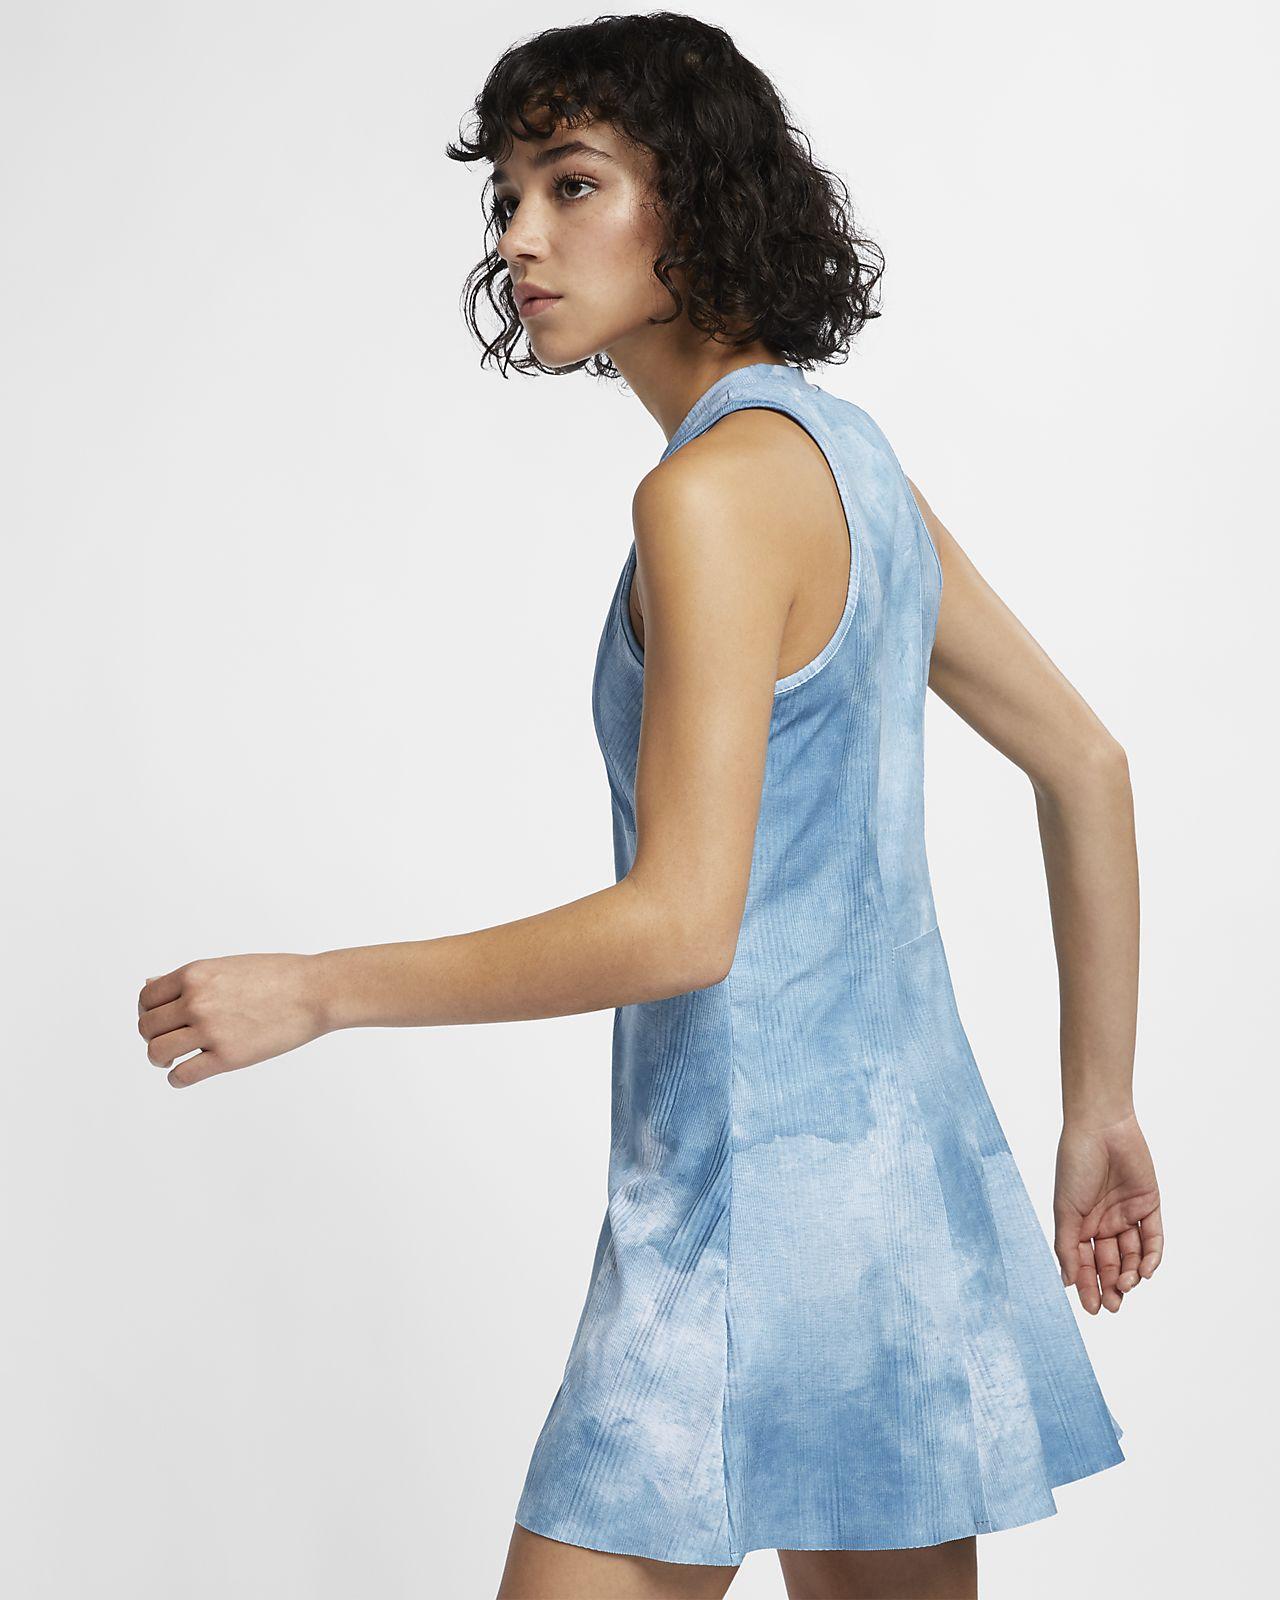 Dámské tenisové šaty NikeCourt Dri-FIT Maria s potiskem. Nike.com CZ 1a13d7a8a55